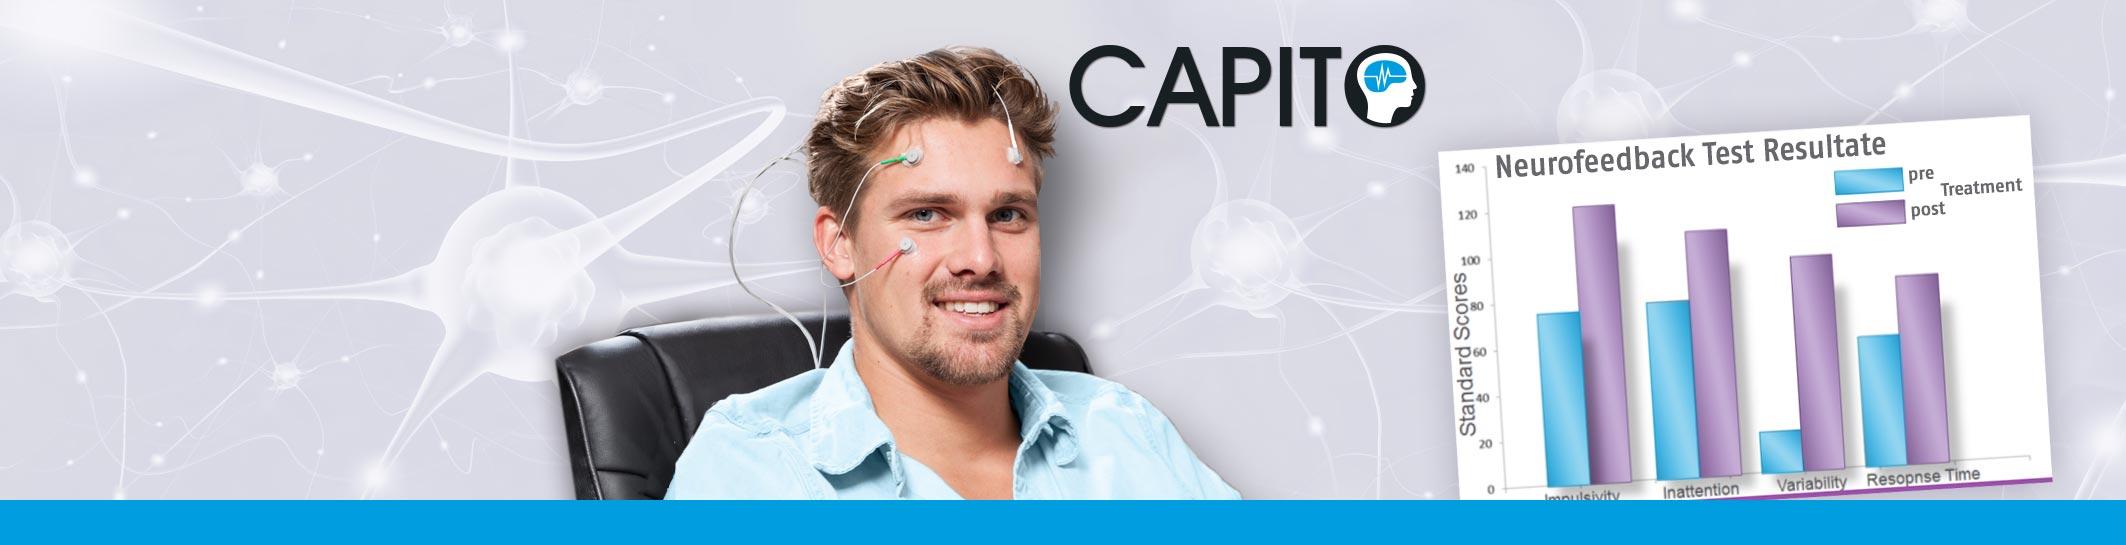 CAPITO - Test für Neurofeedback, Biofeedback, Coaching